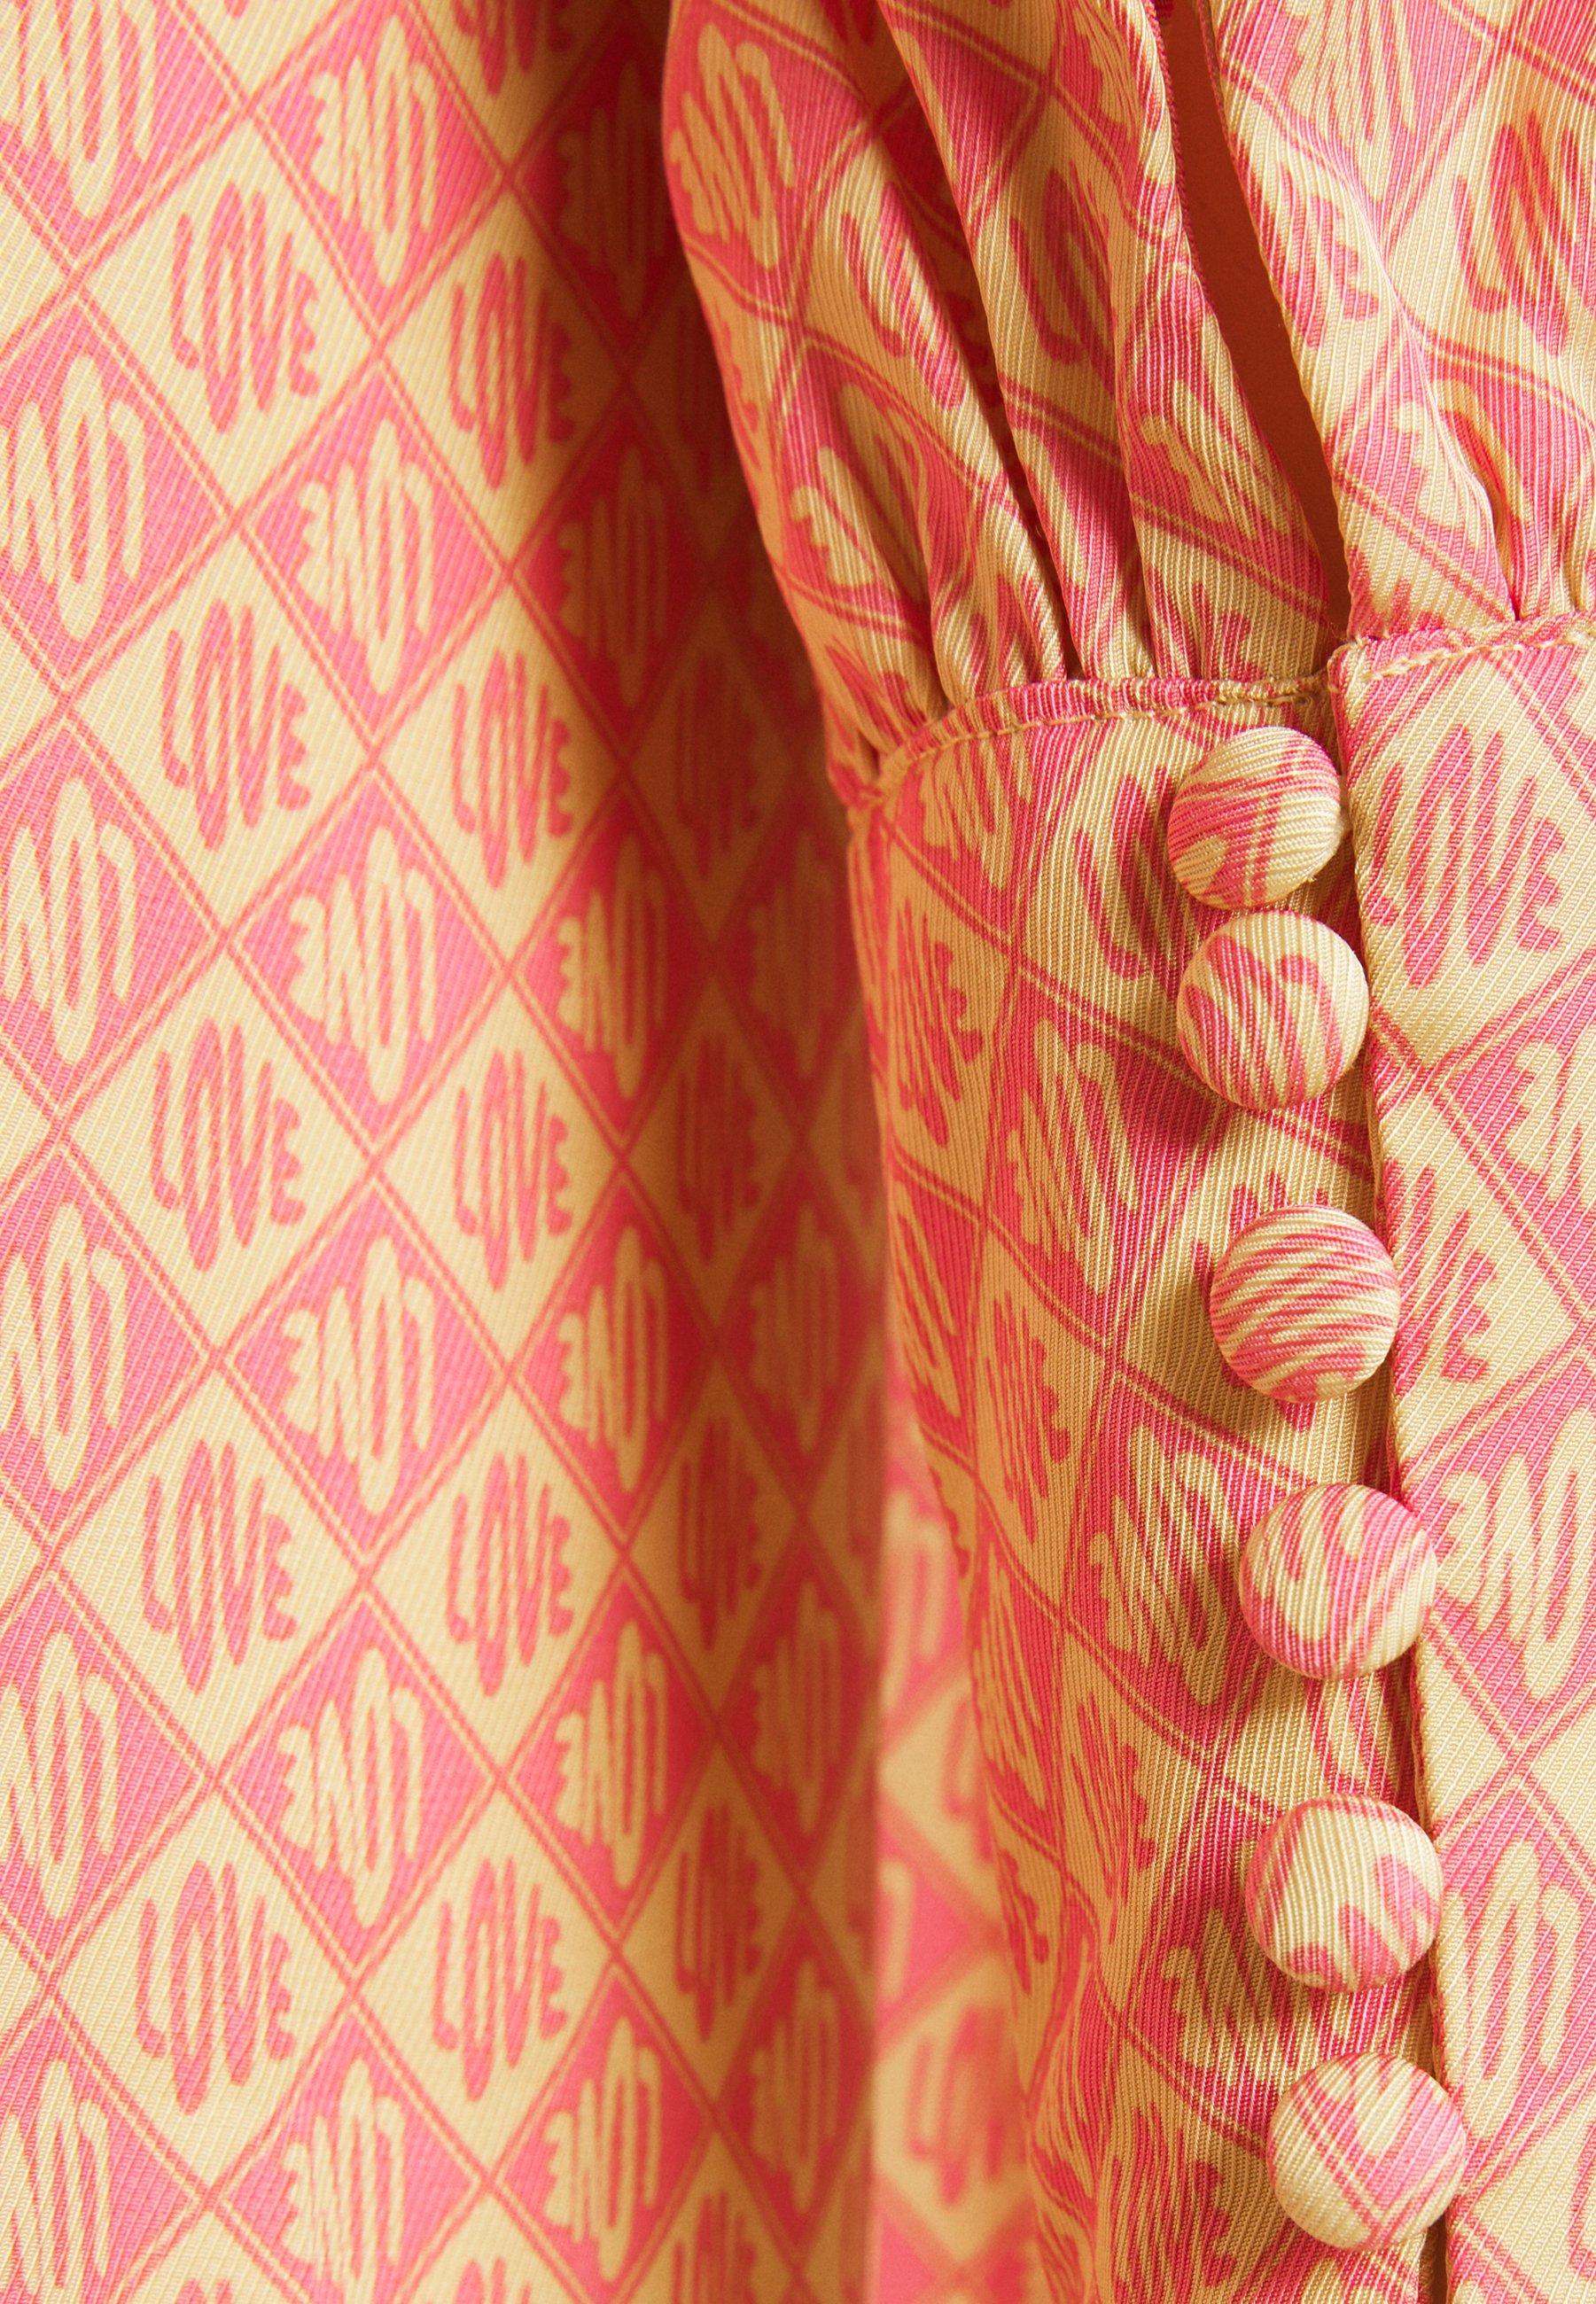 Cut-Price Women's Clothing Birgitte Herskind SUSSI DRESS Maxi dress pink love nK6x3CjbI